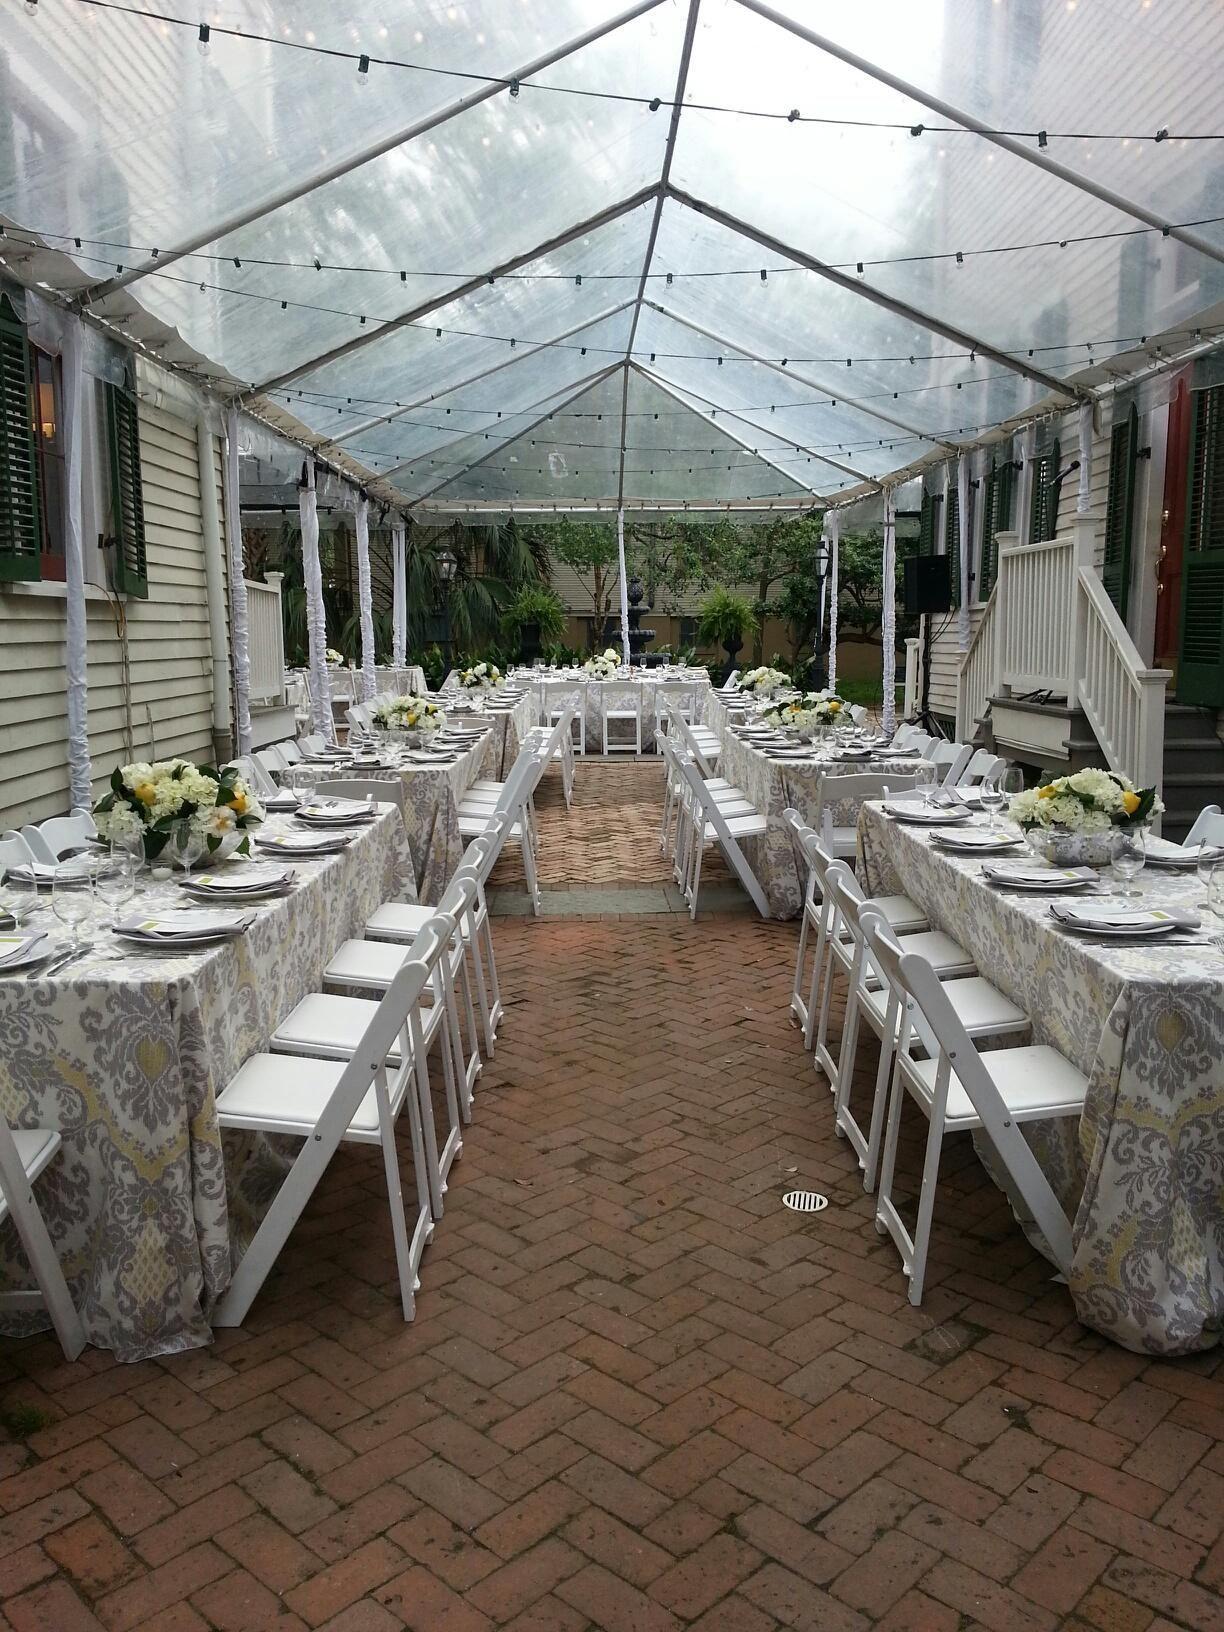 Rehearsal Dinners At Degas House Wedding Dinnerswedding Venueswedding Inspiration